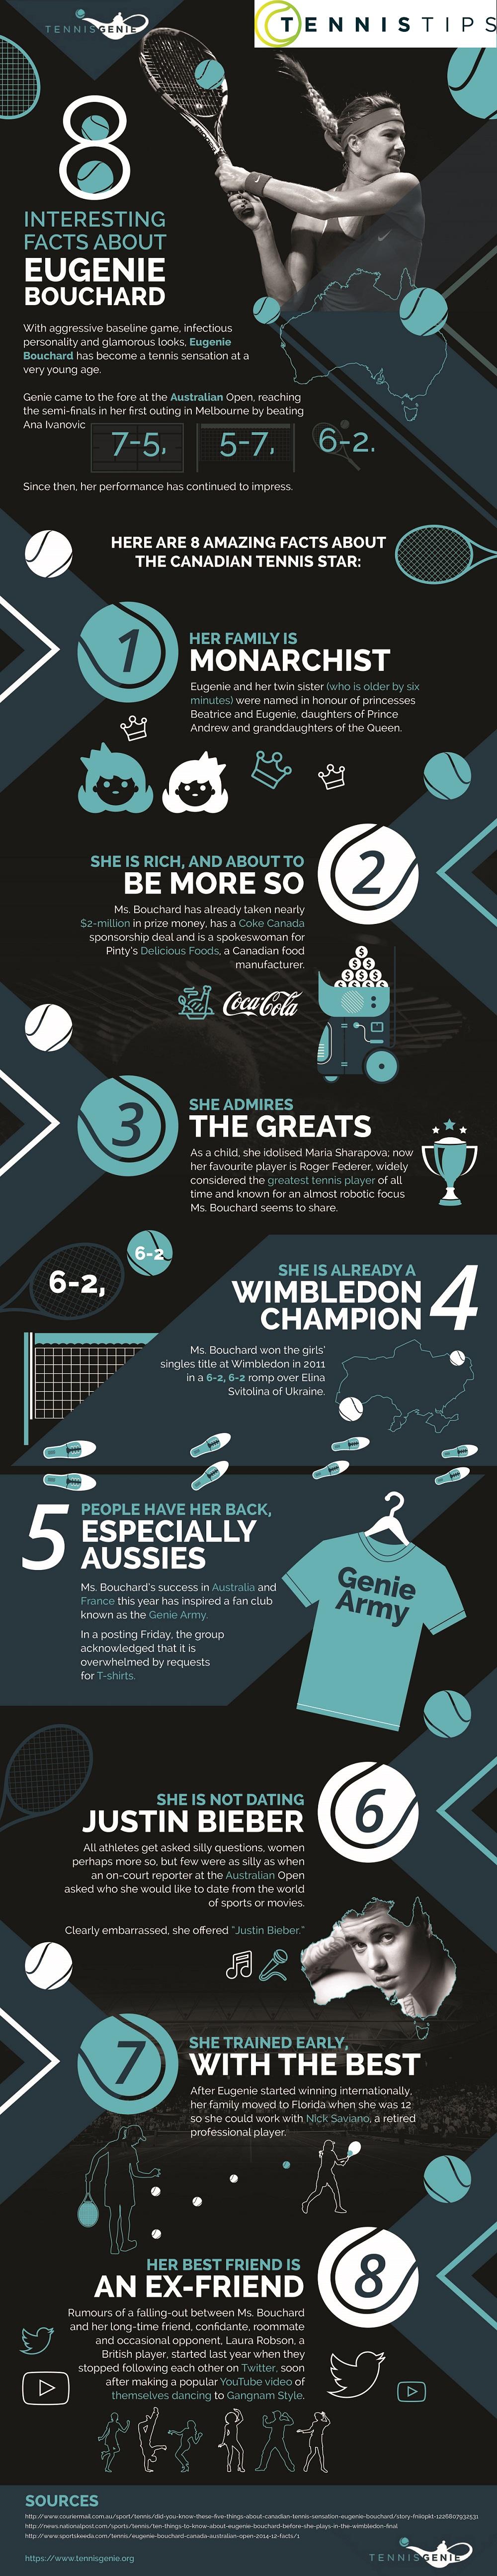 Eugenie Bouchard | Story so far Infographic | Tennis Tips UK